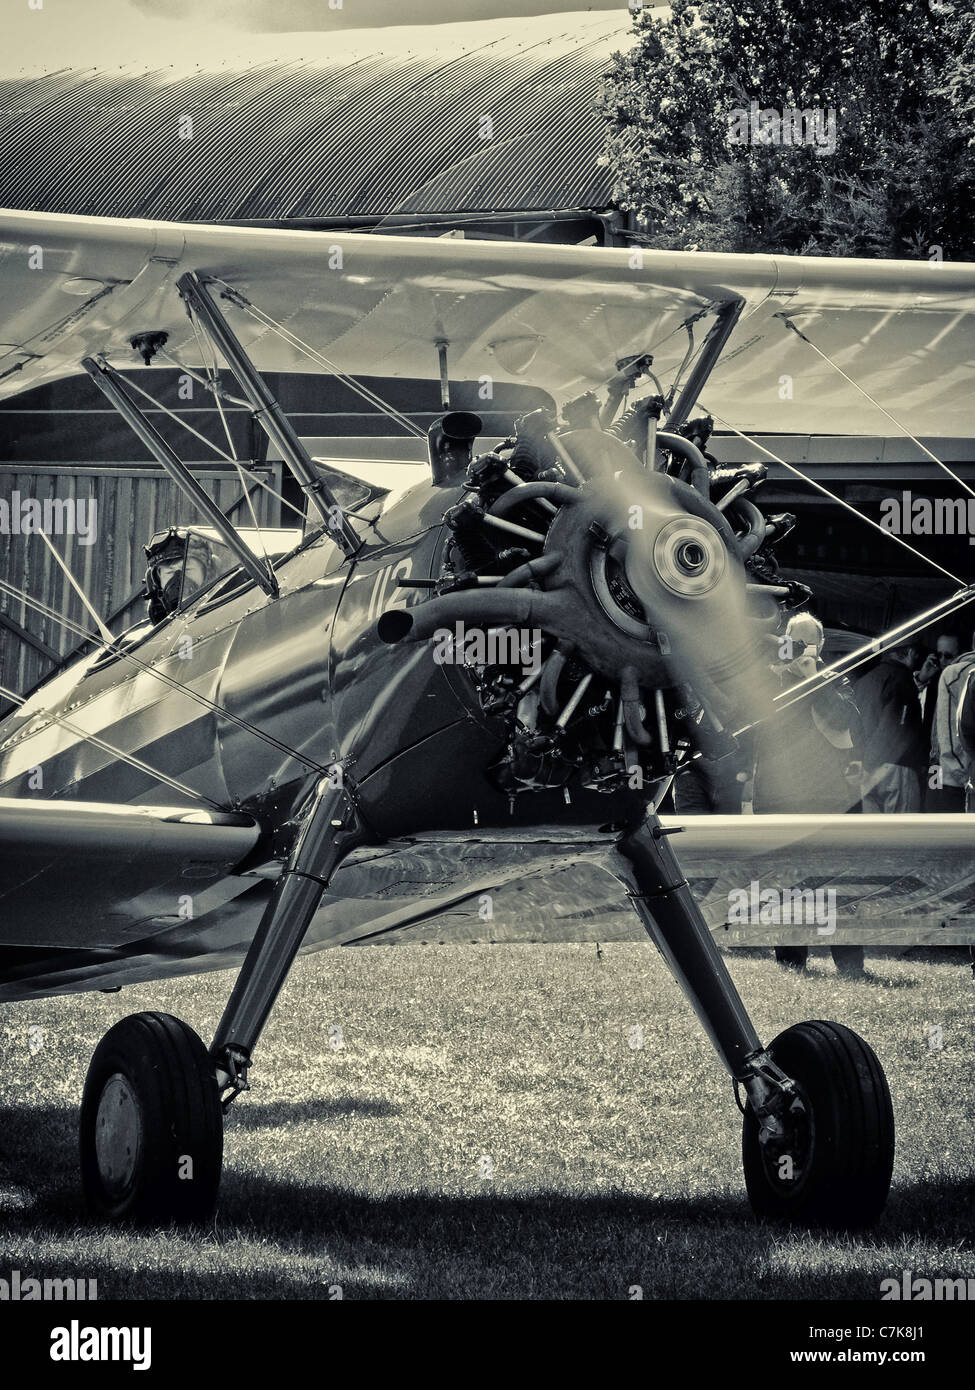 Boeing Stearman biplane taxying - Stock Image